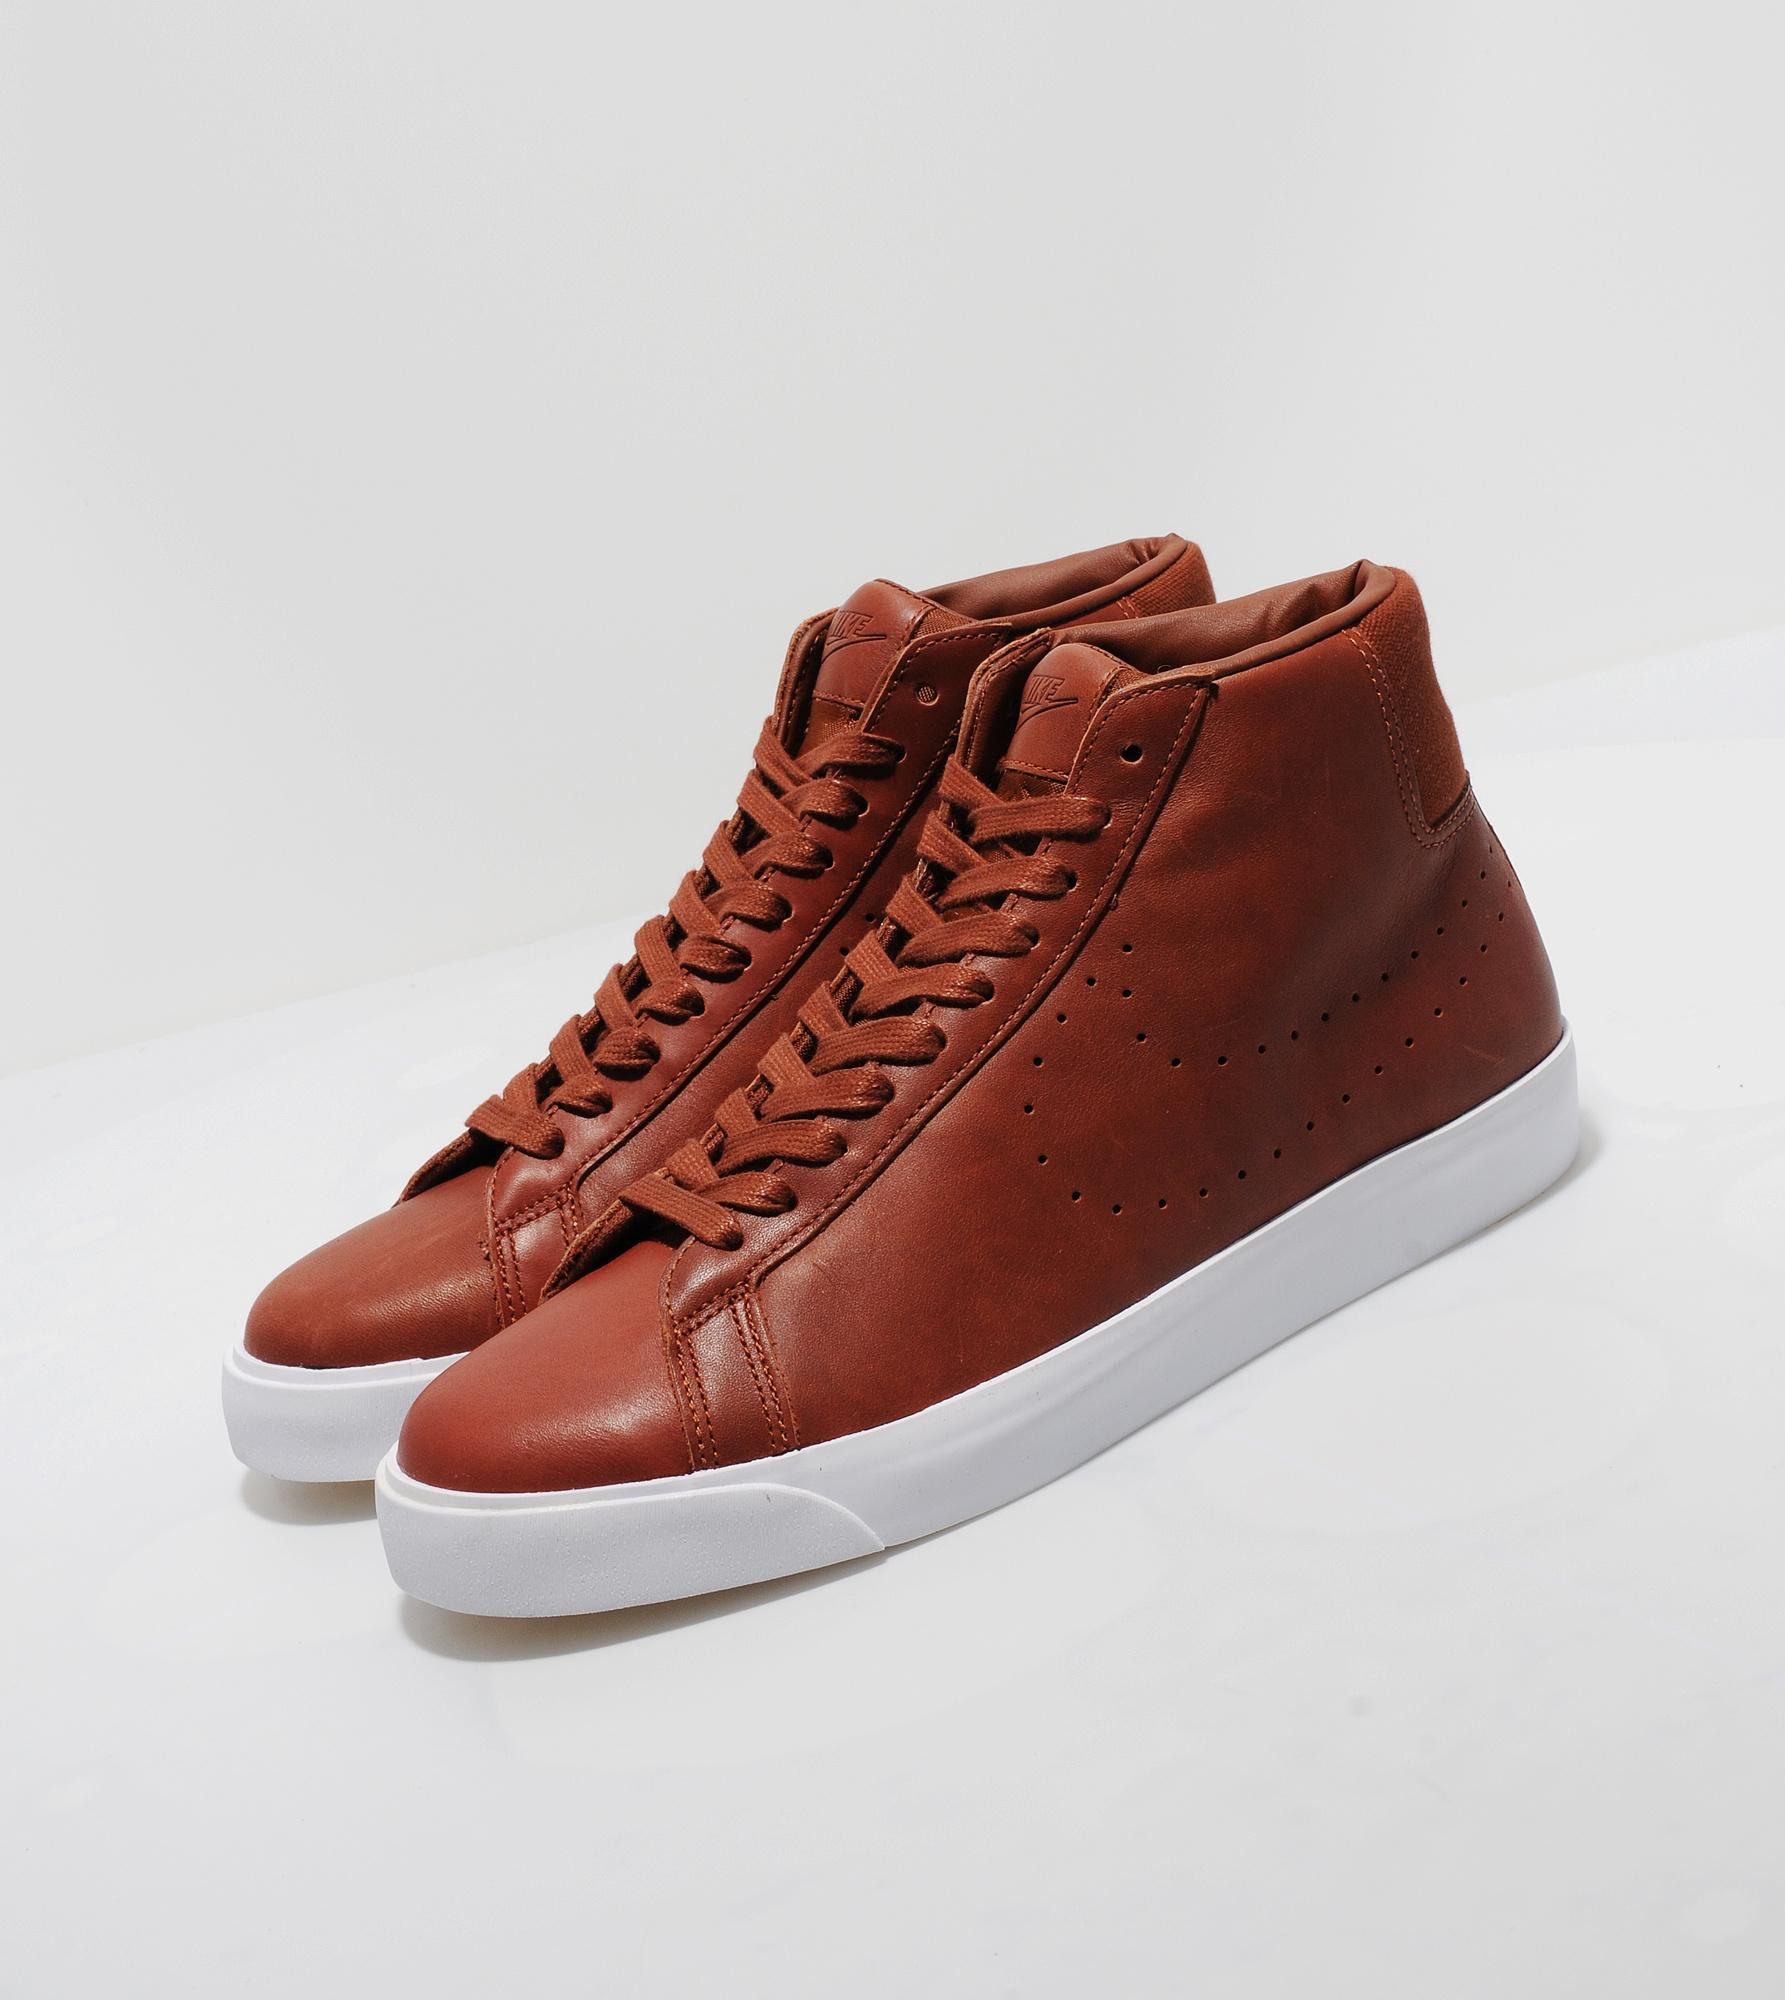 nike blazer premium leather